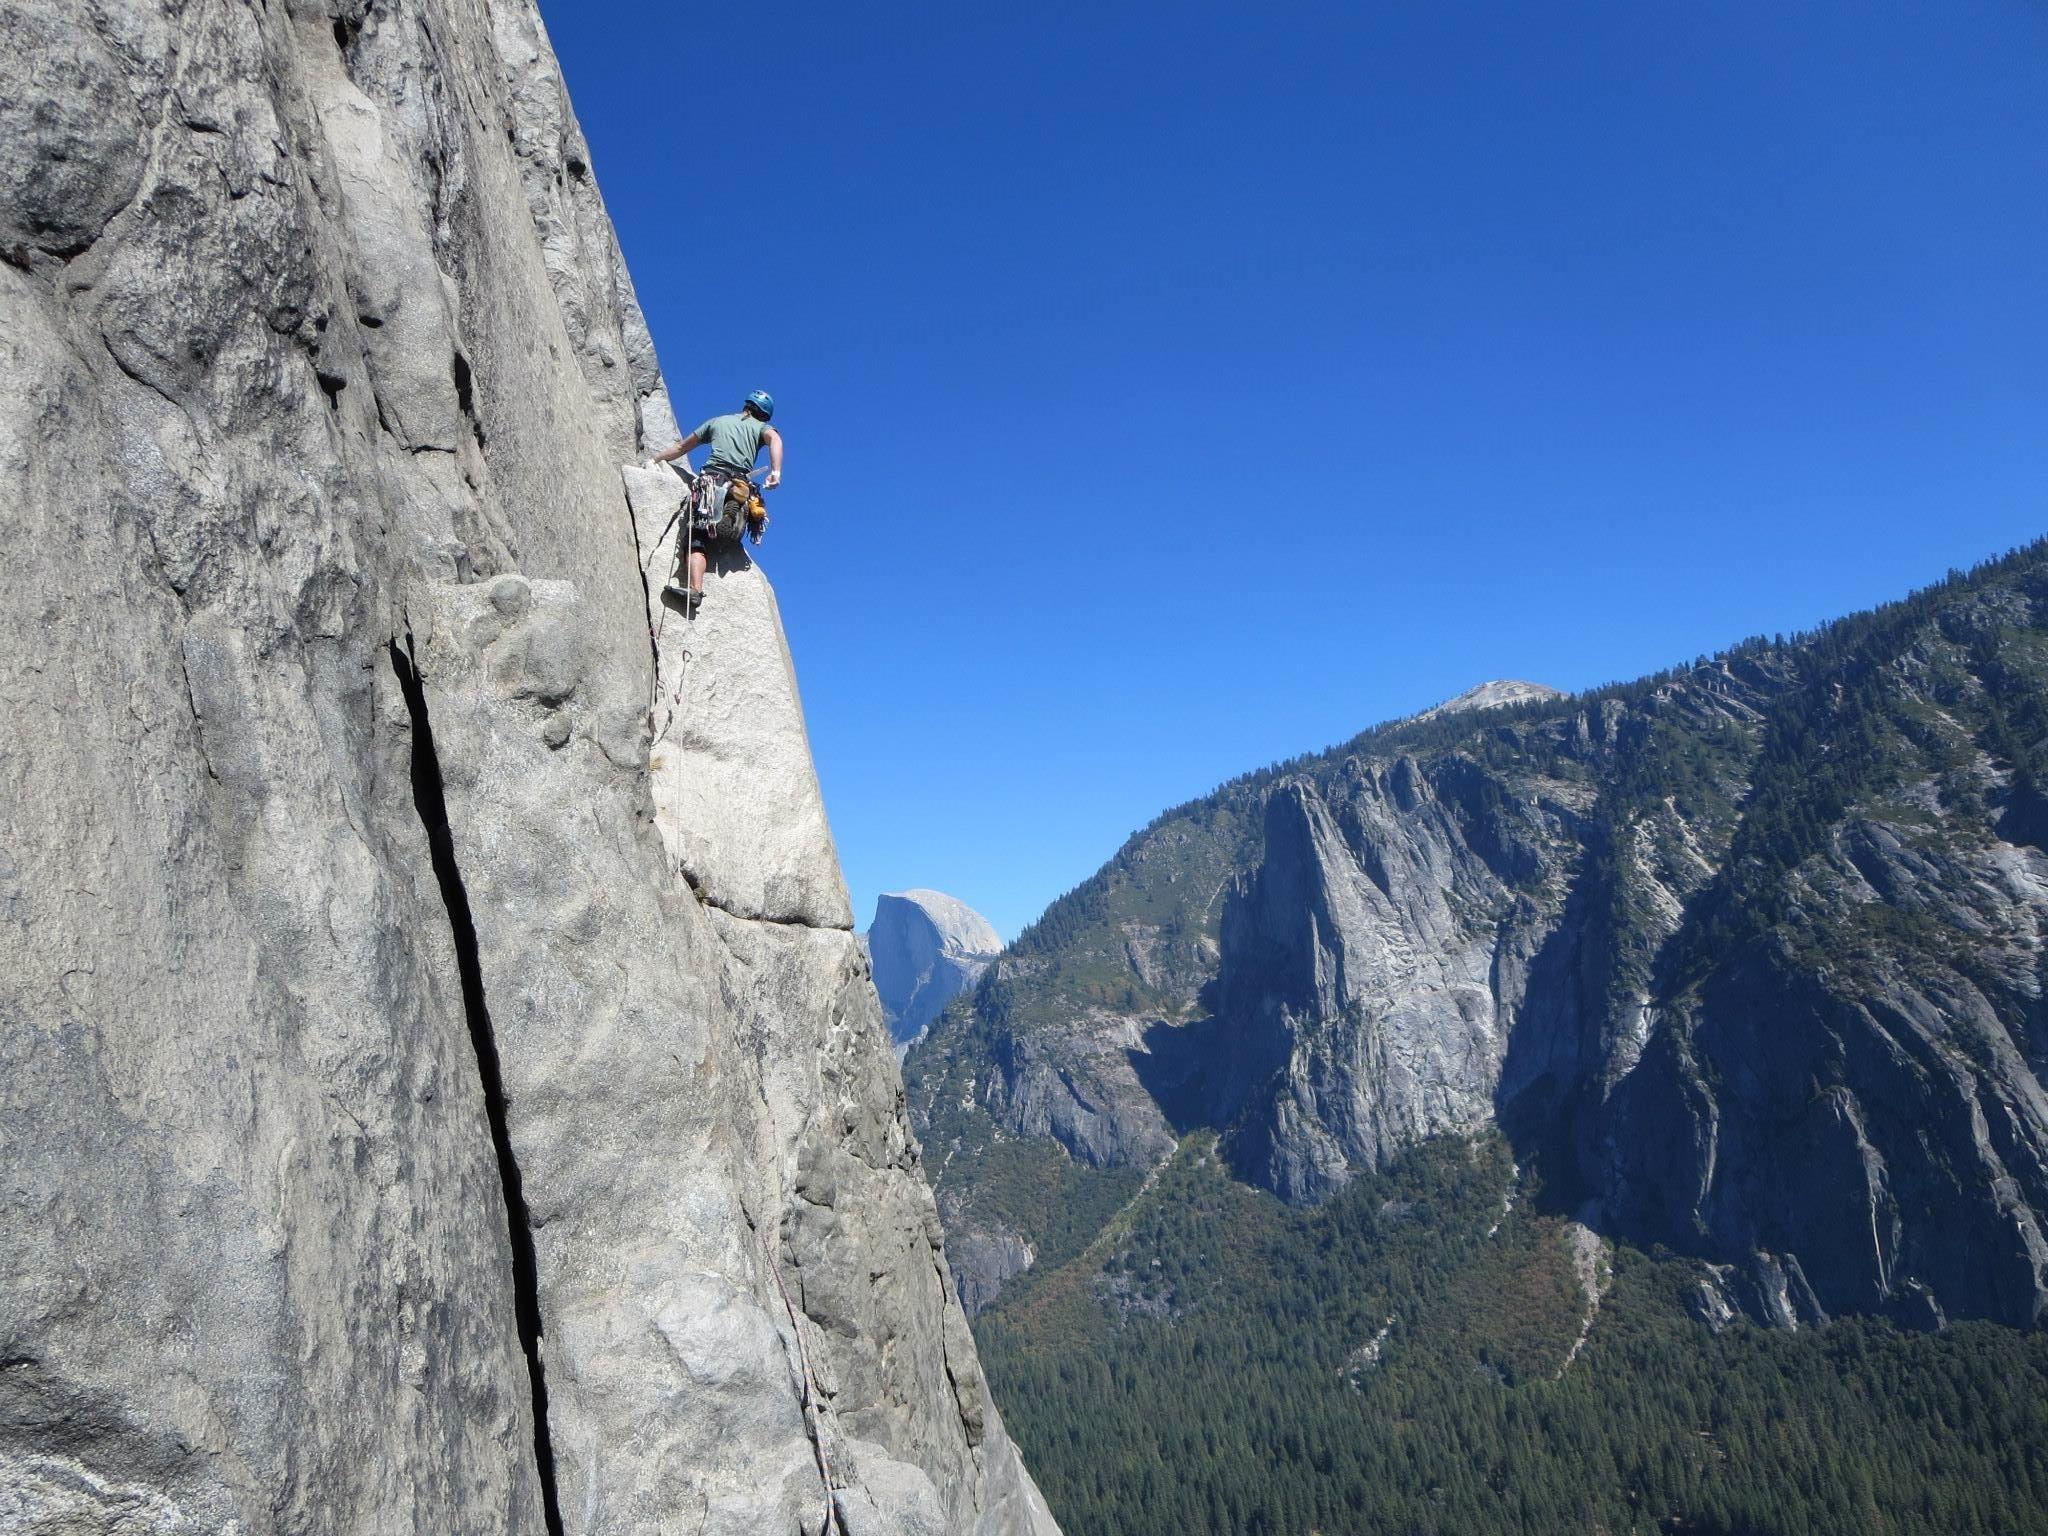 Dr. Stephen climbing on El Capitan